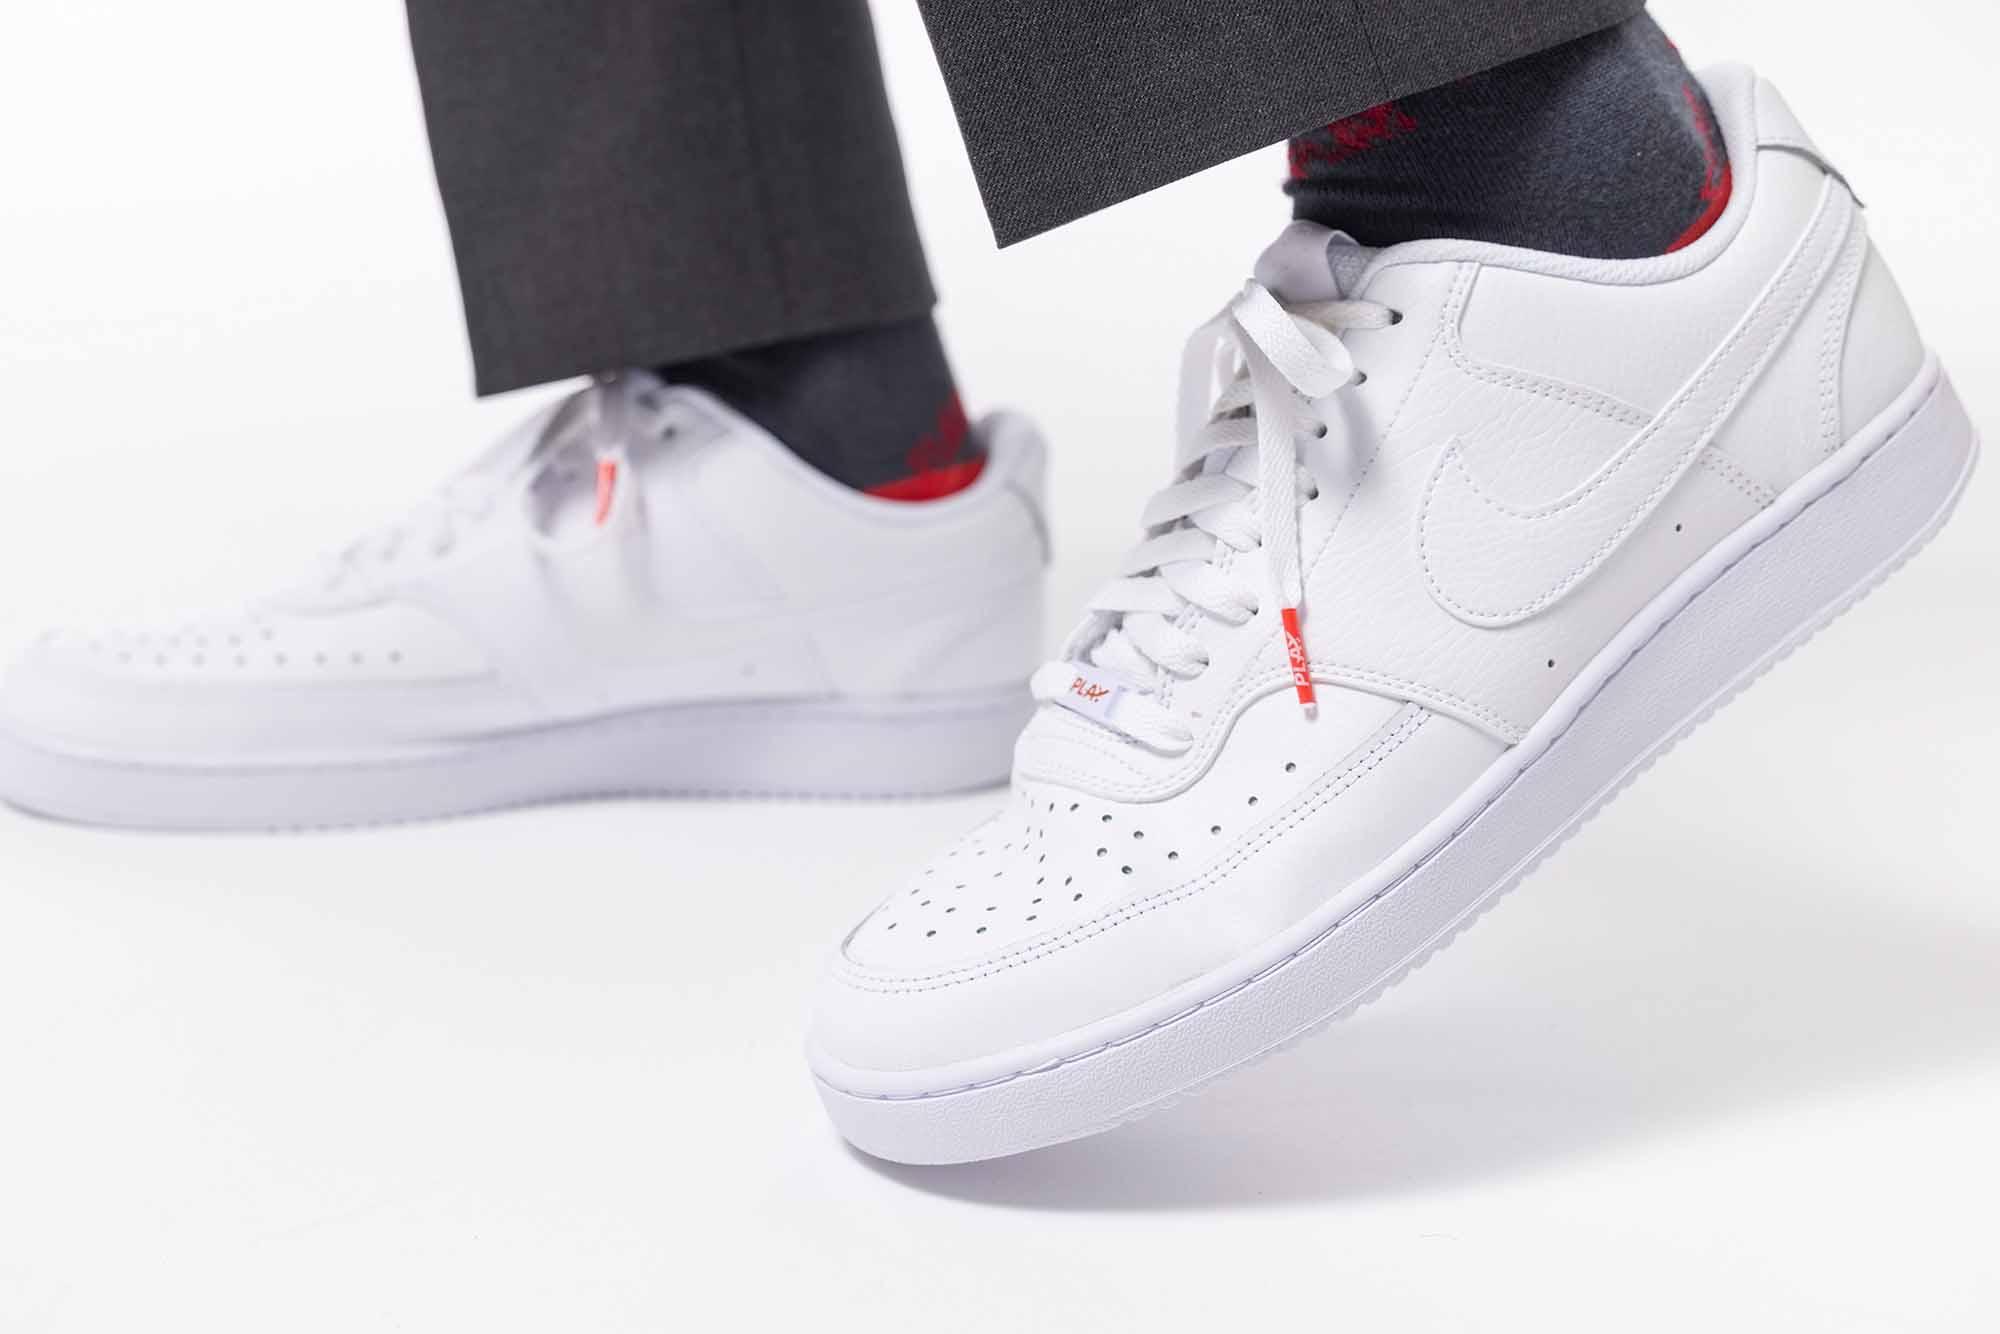 Bequem unterwegs mit Sneakers / Foto: PLAY